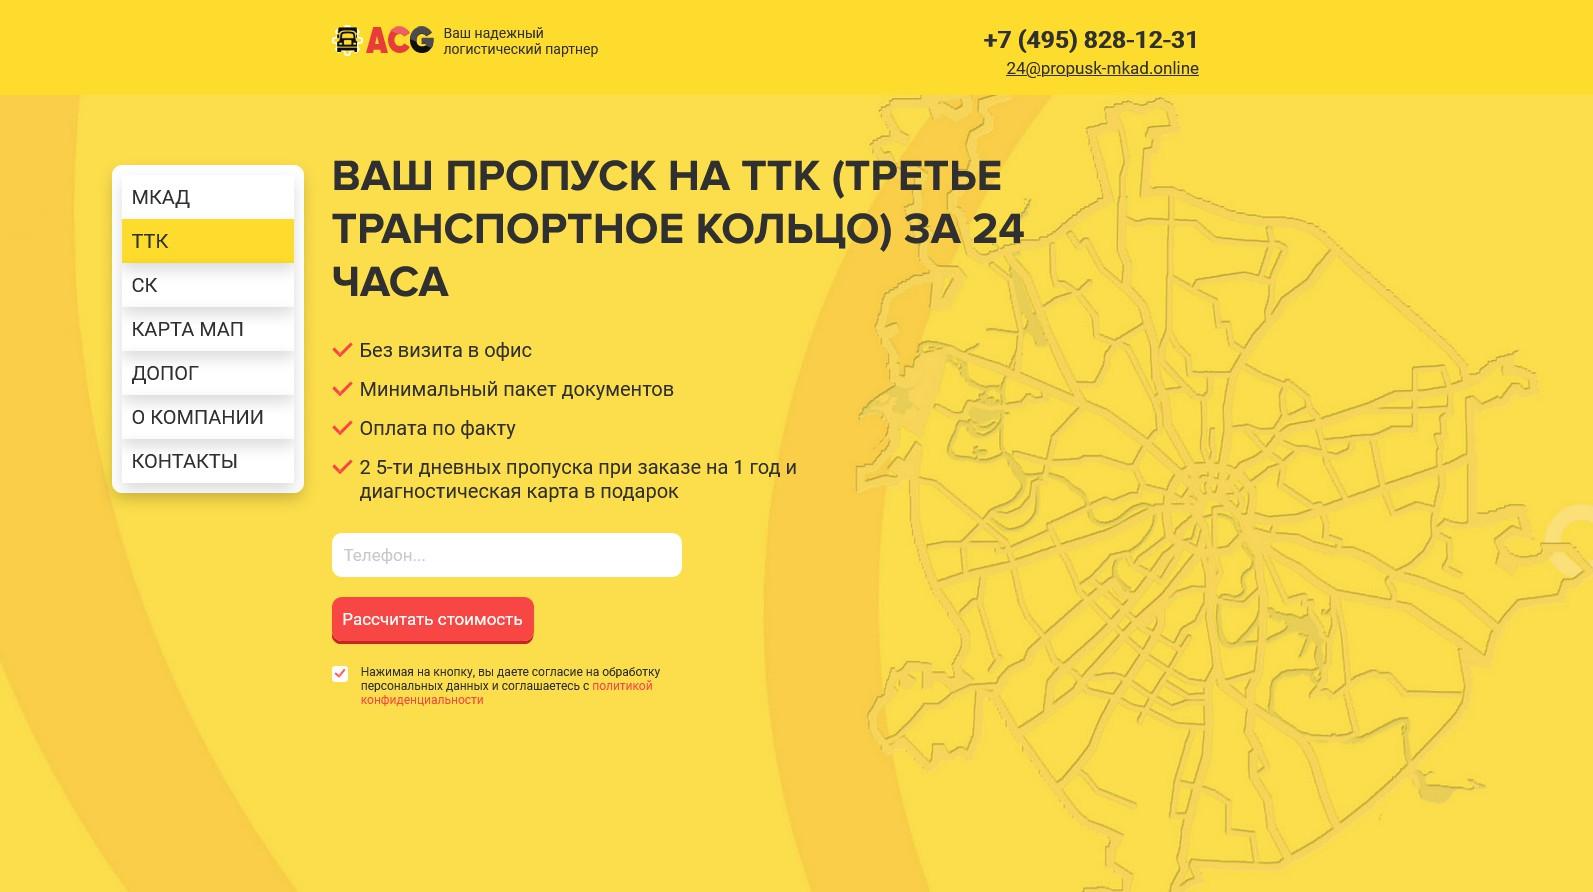 http://пропуск-мкад.онлайн/